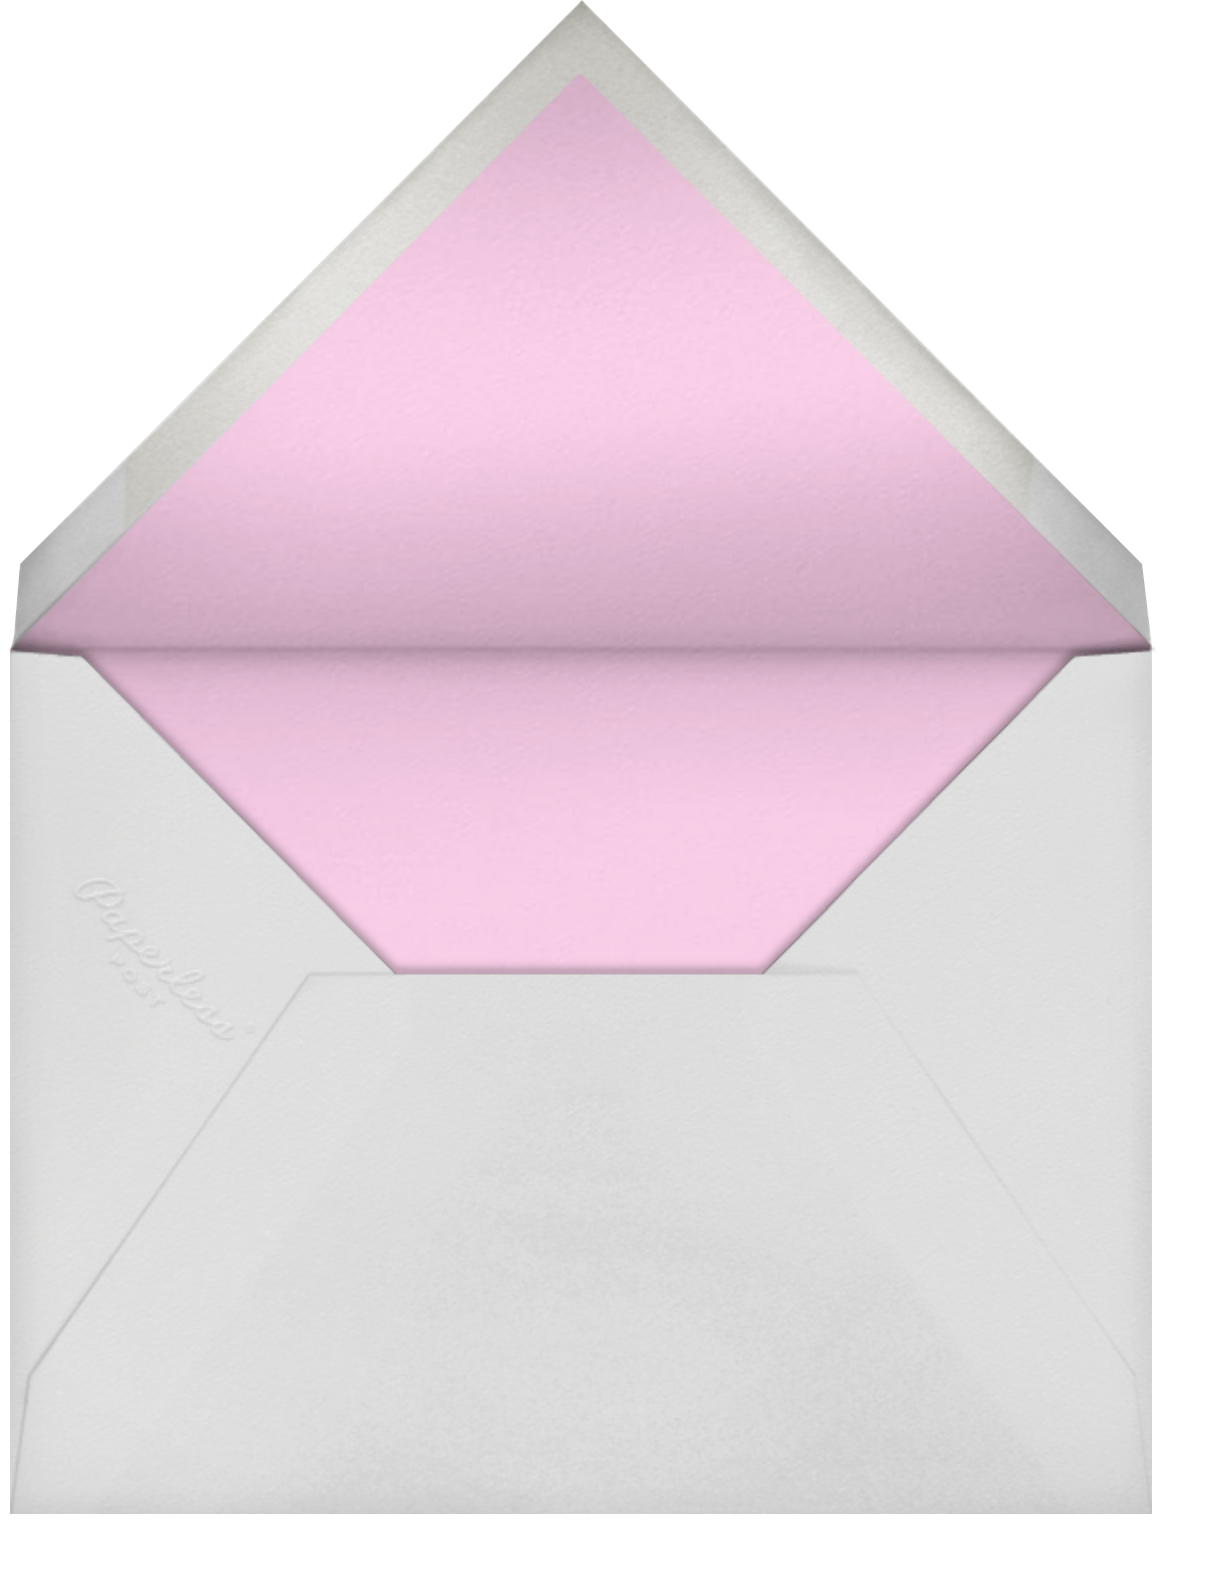 Piggy Picnic - Gray Malin - 1st birthday - envelope back